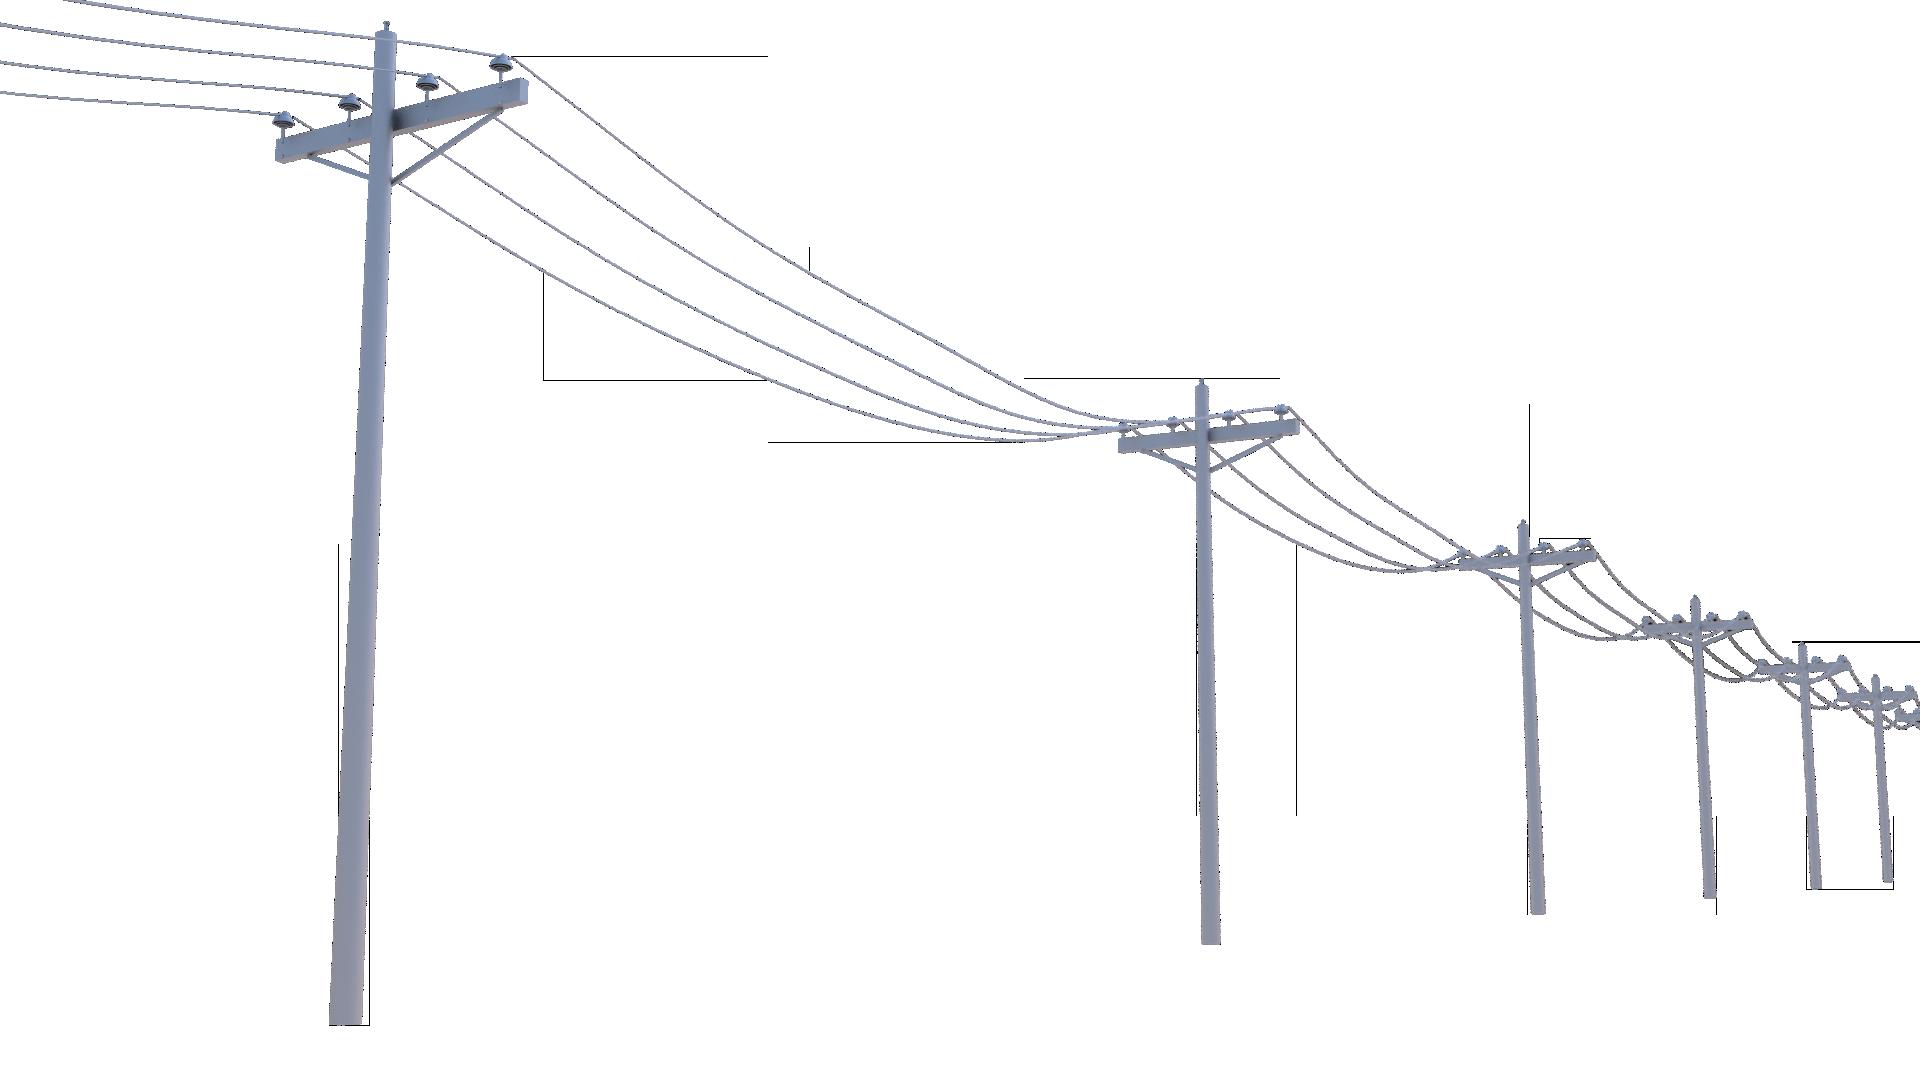 4 wire telephone line diagram  | 584 x 265